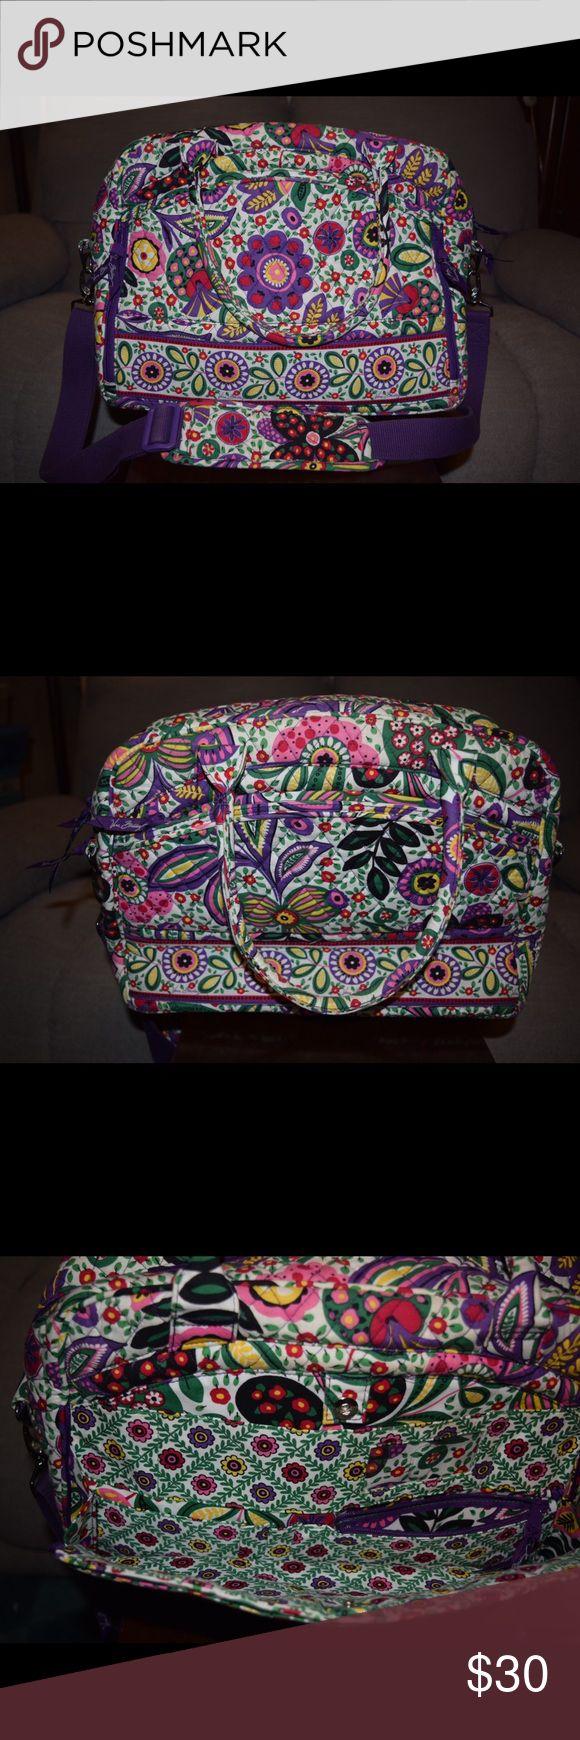 Vera Bradley laptop travel bag. Vera Bradley laptop bag. Pattern is Viva La Vera. Very nice condition Vera Bradley Bags Laptop Bags